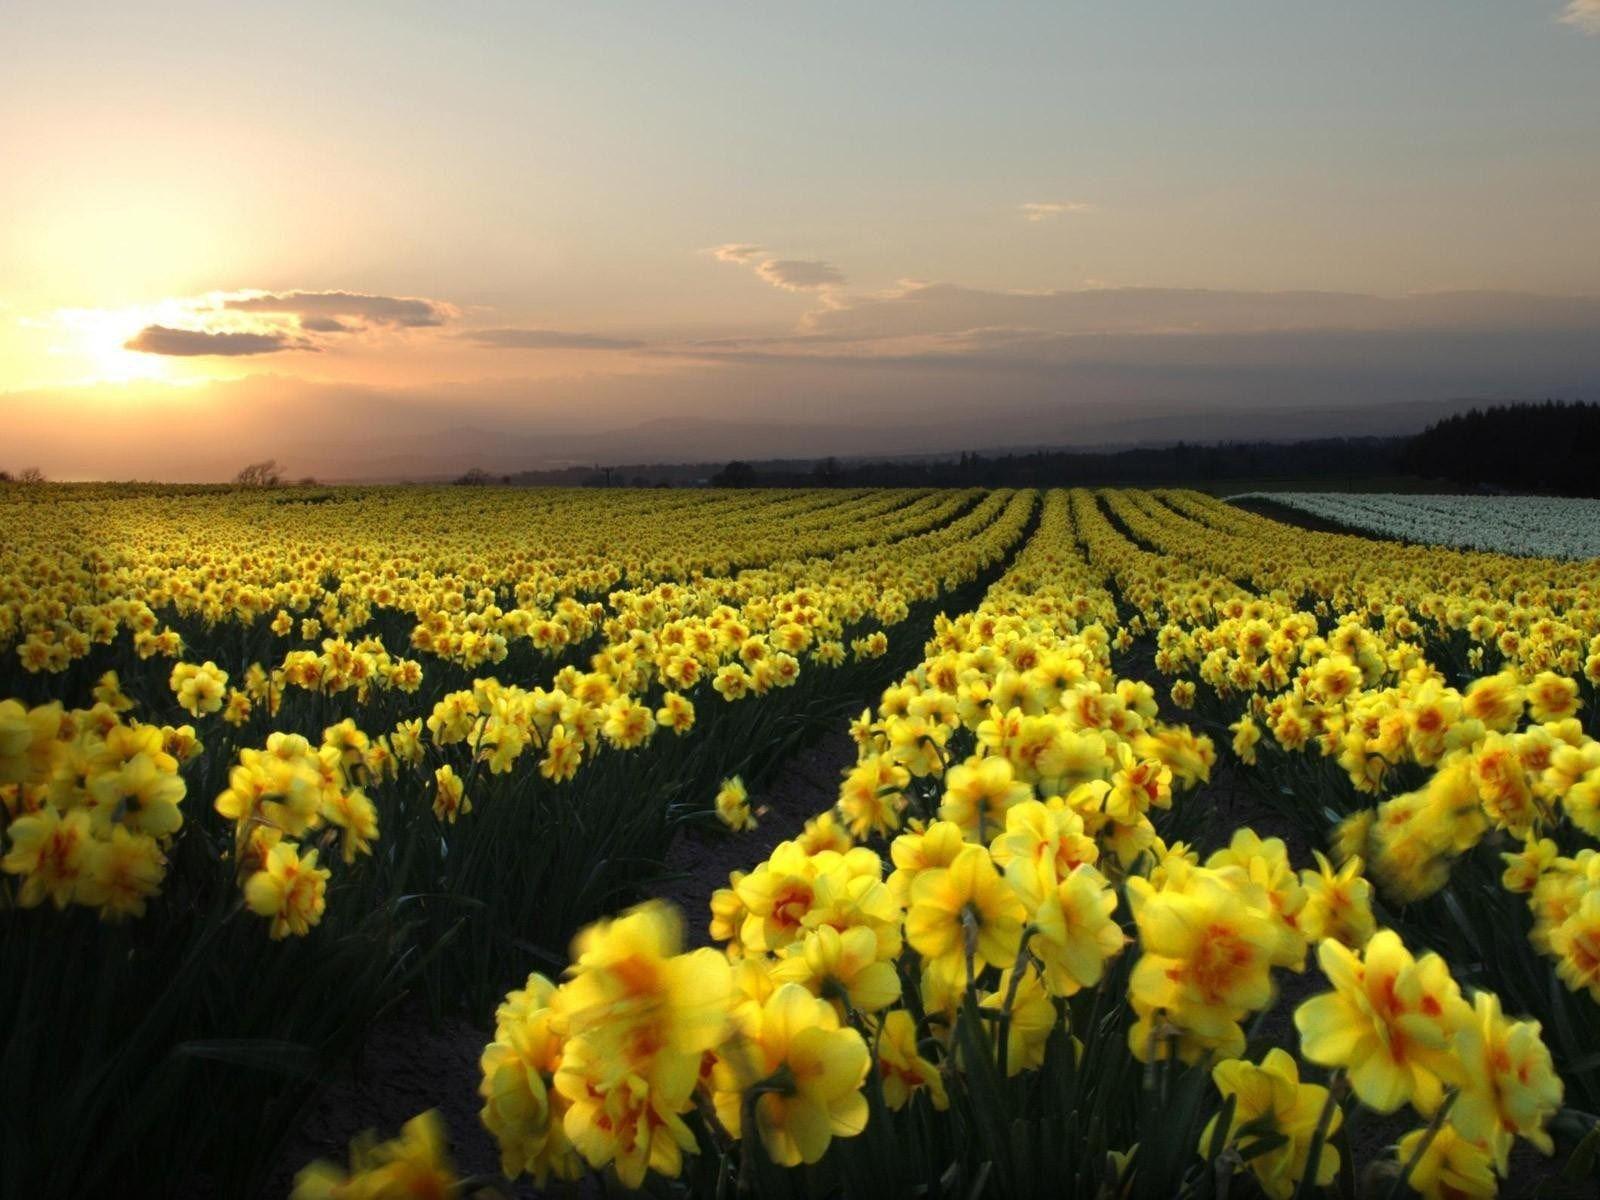 daffodil wallpaper - background hd (pittman black 1600x1200